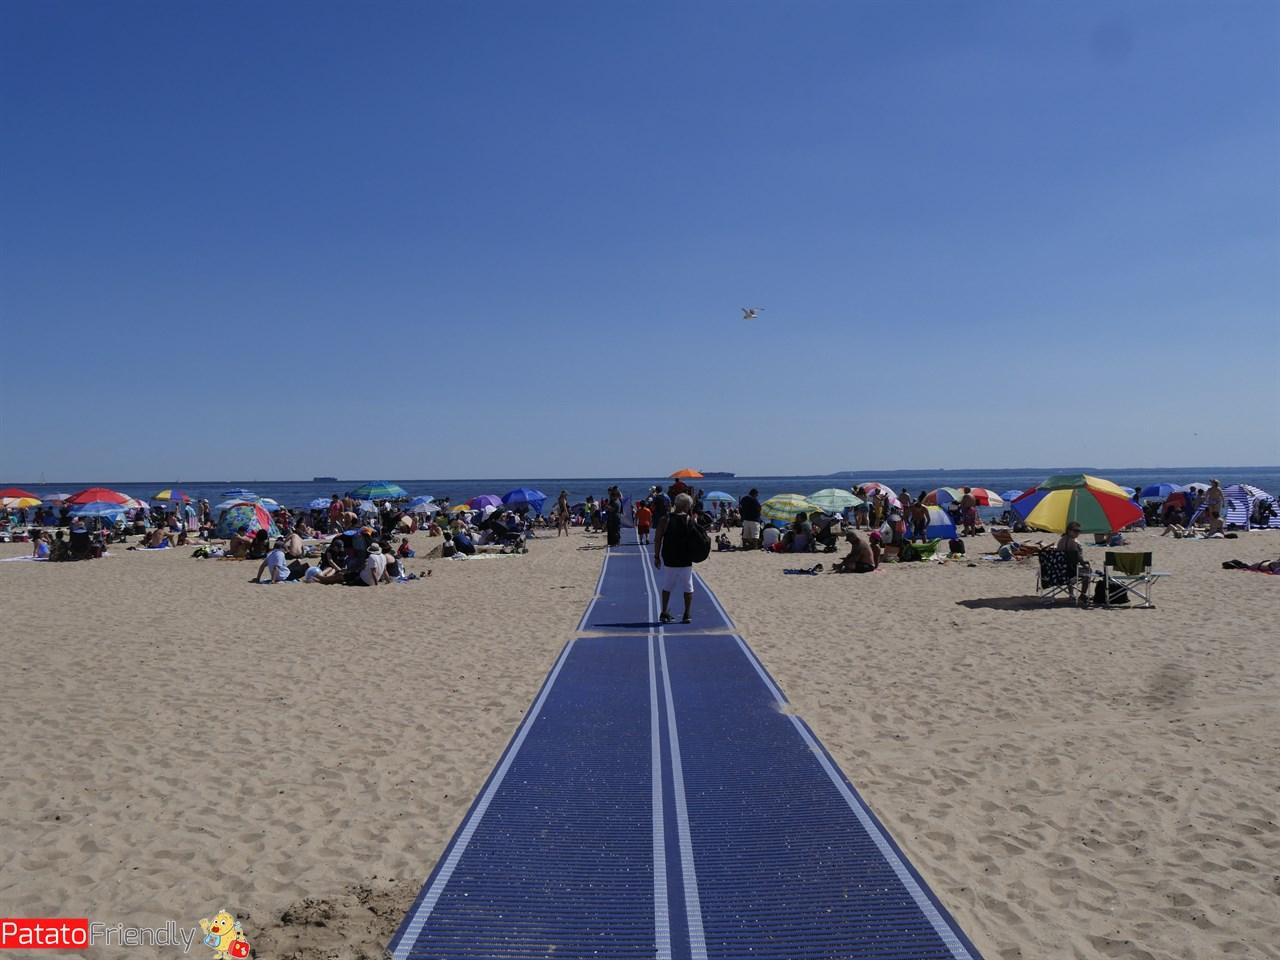 [cml_media_alt id='13782']Andare in spiaggia a Coney Island coi bambini[/cml_media_alt]